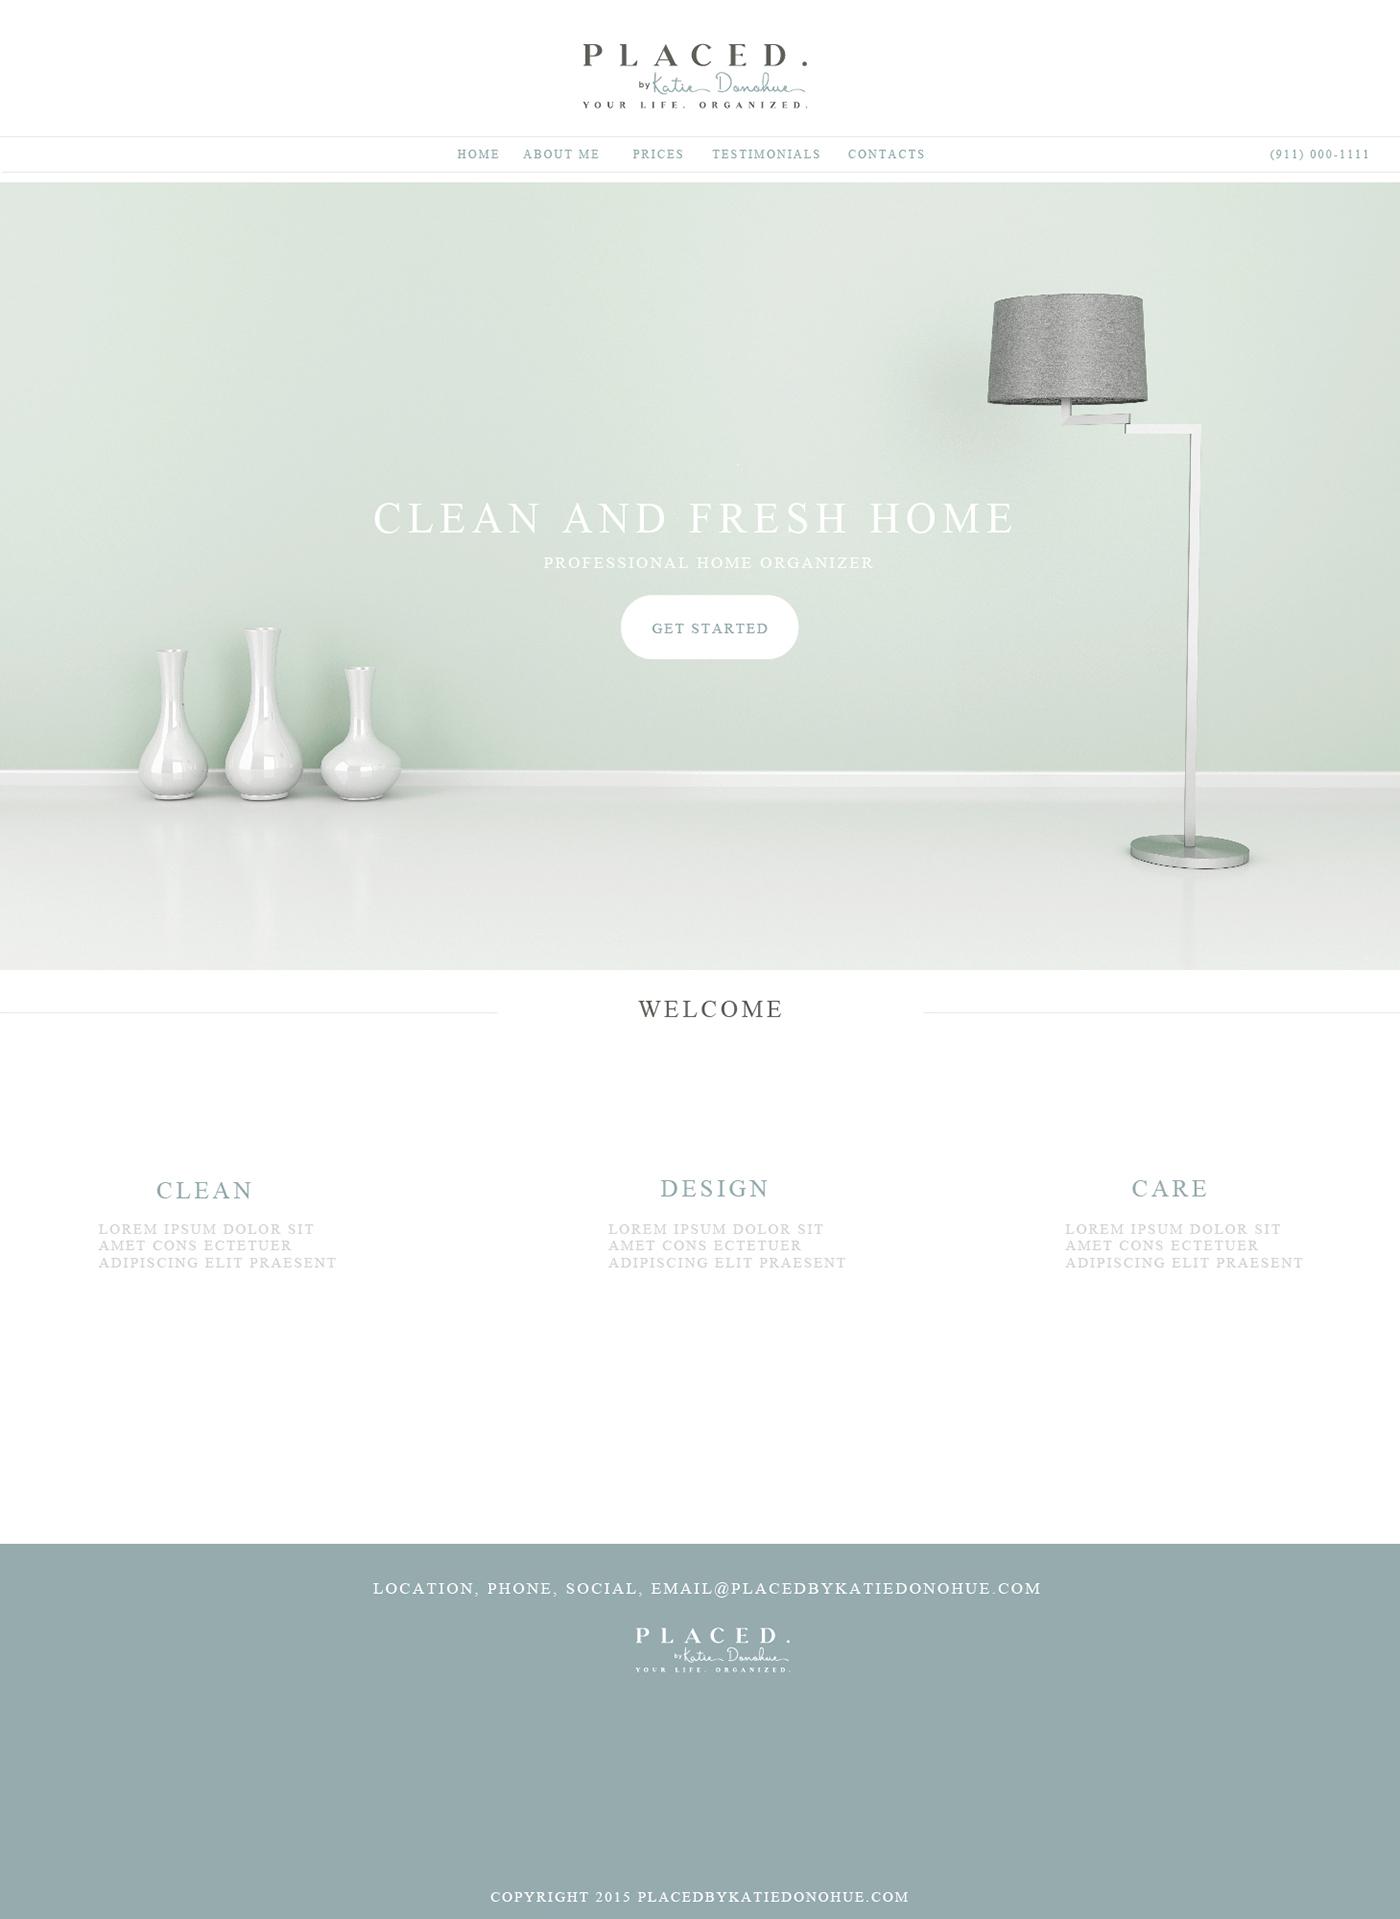 Placed. Web design